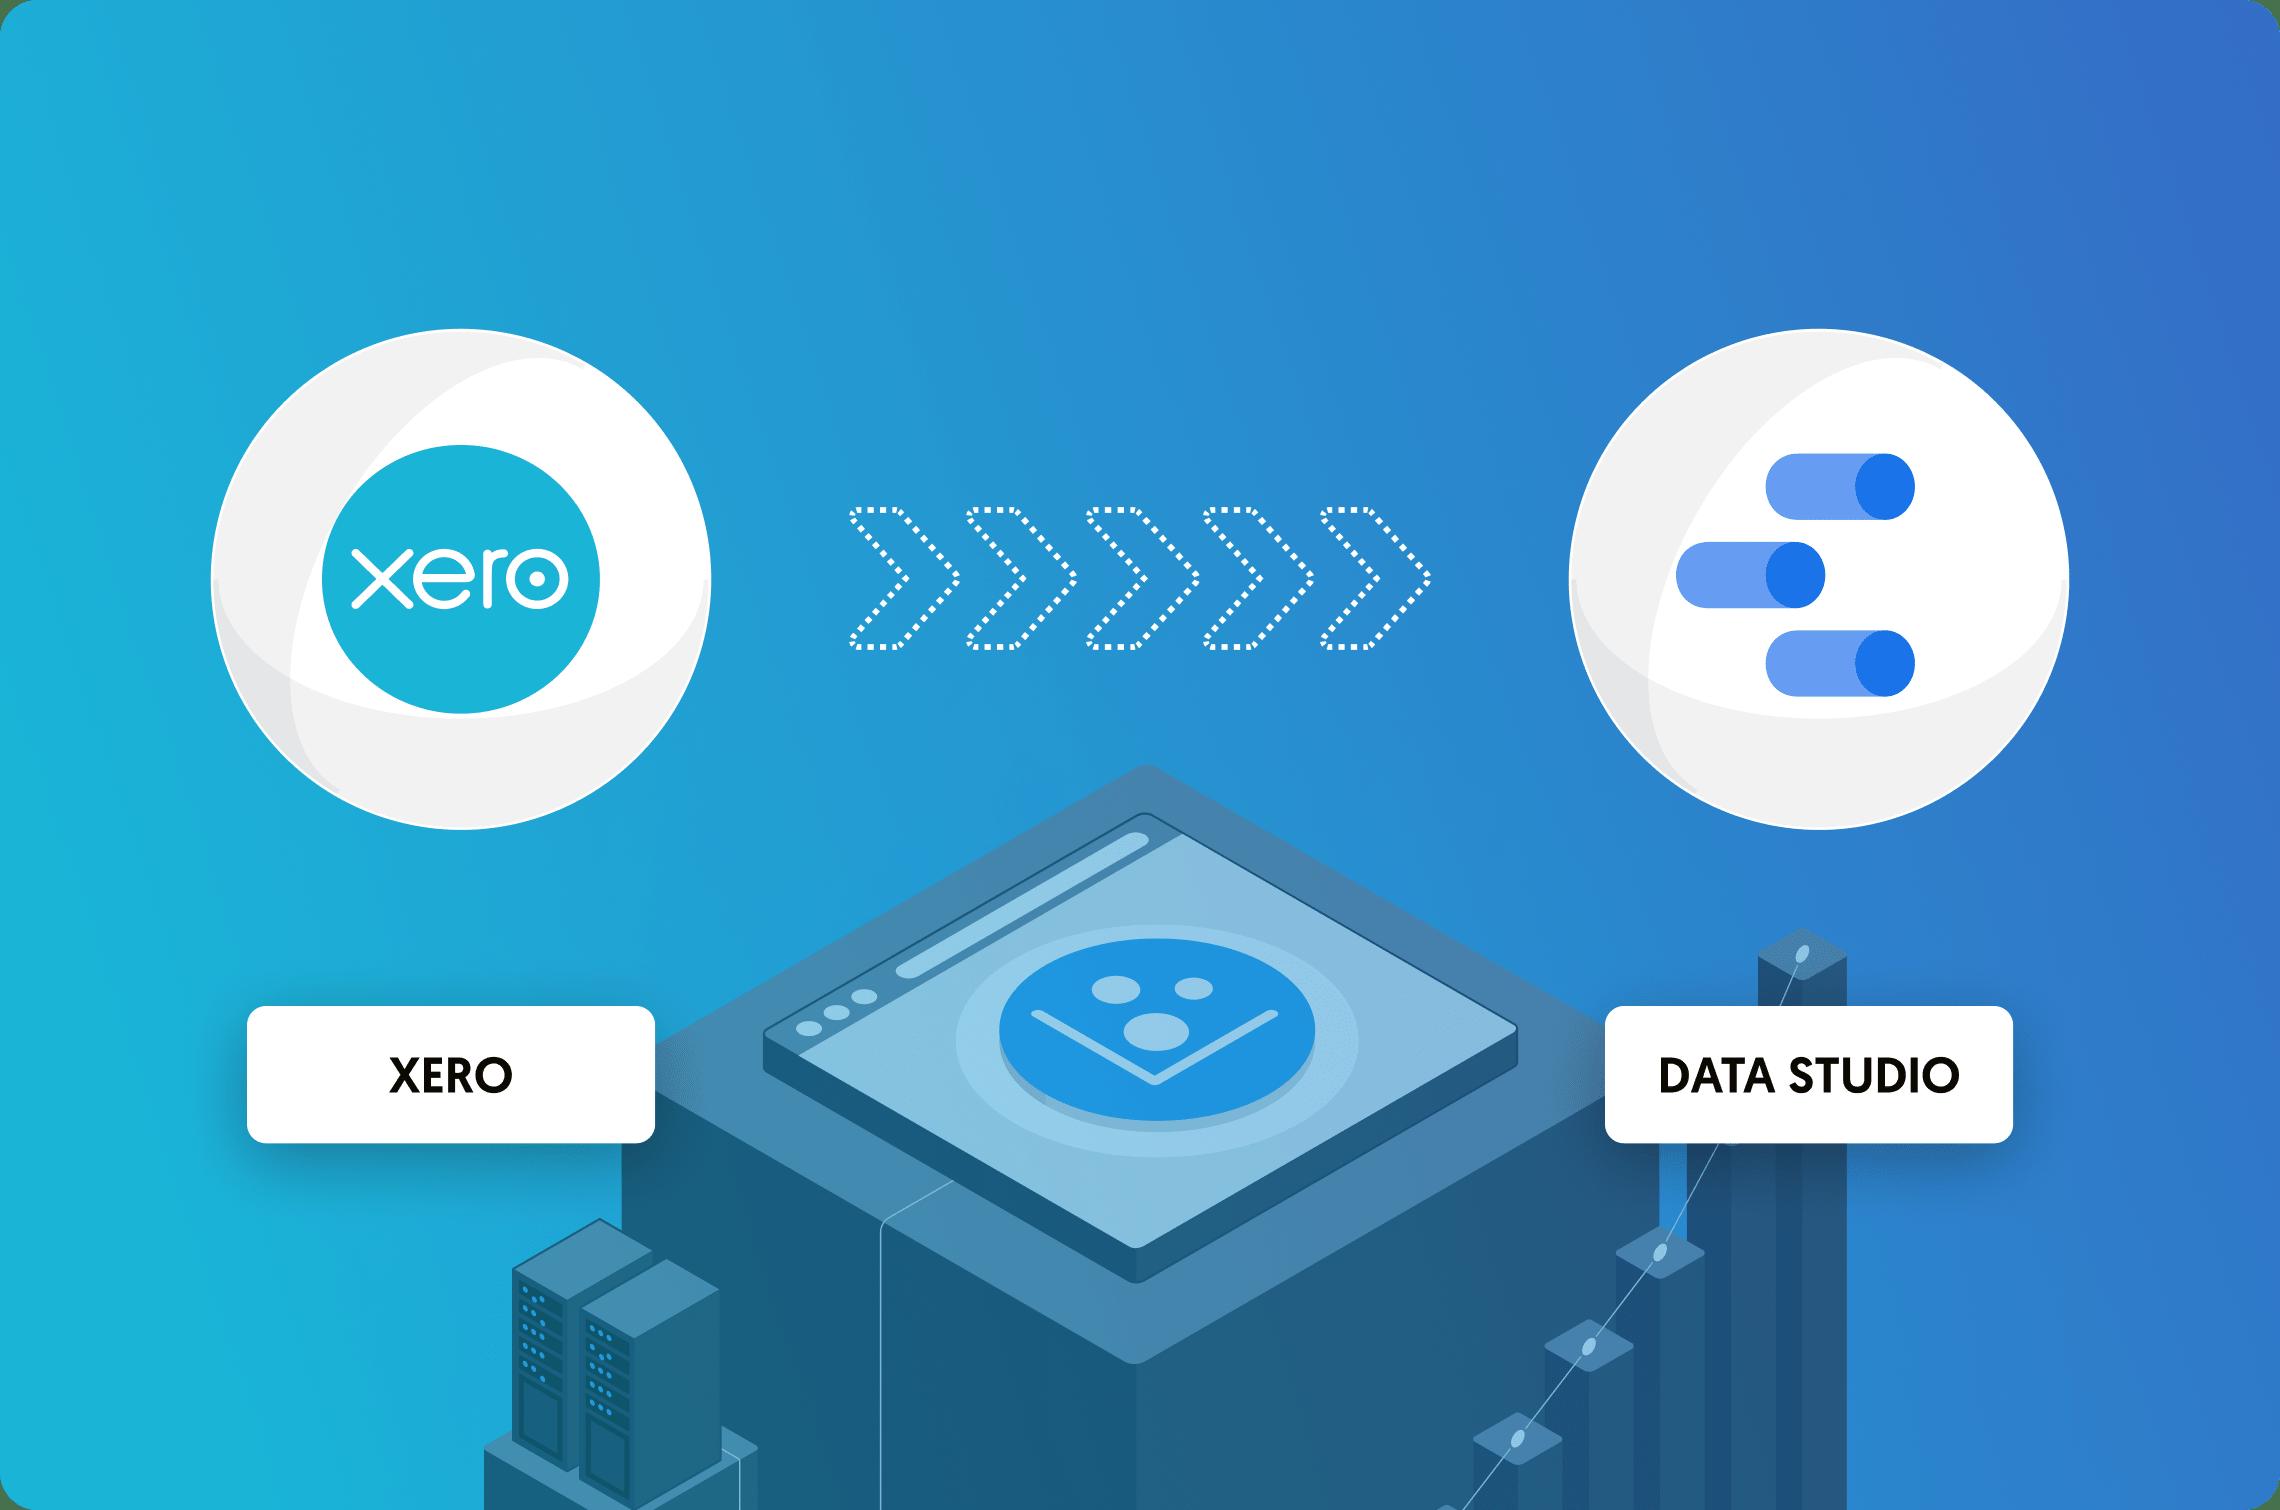 How to Connect Xero to Google Data Studio